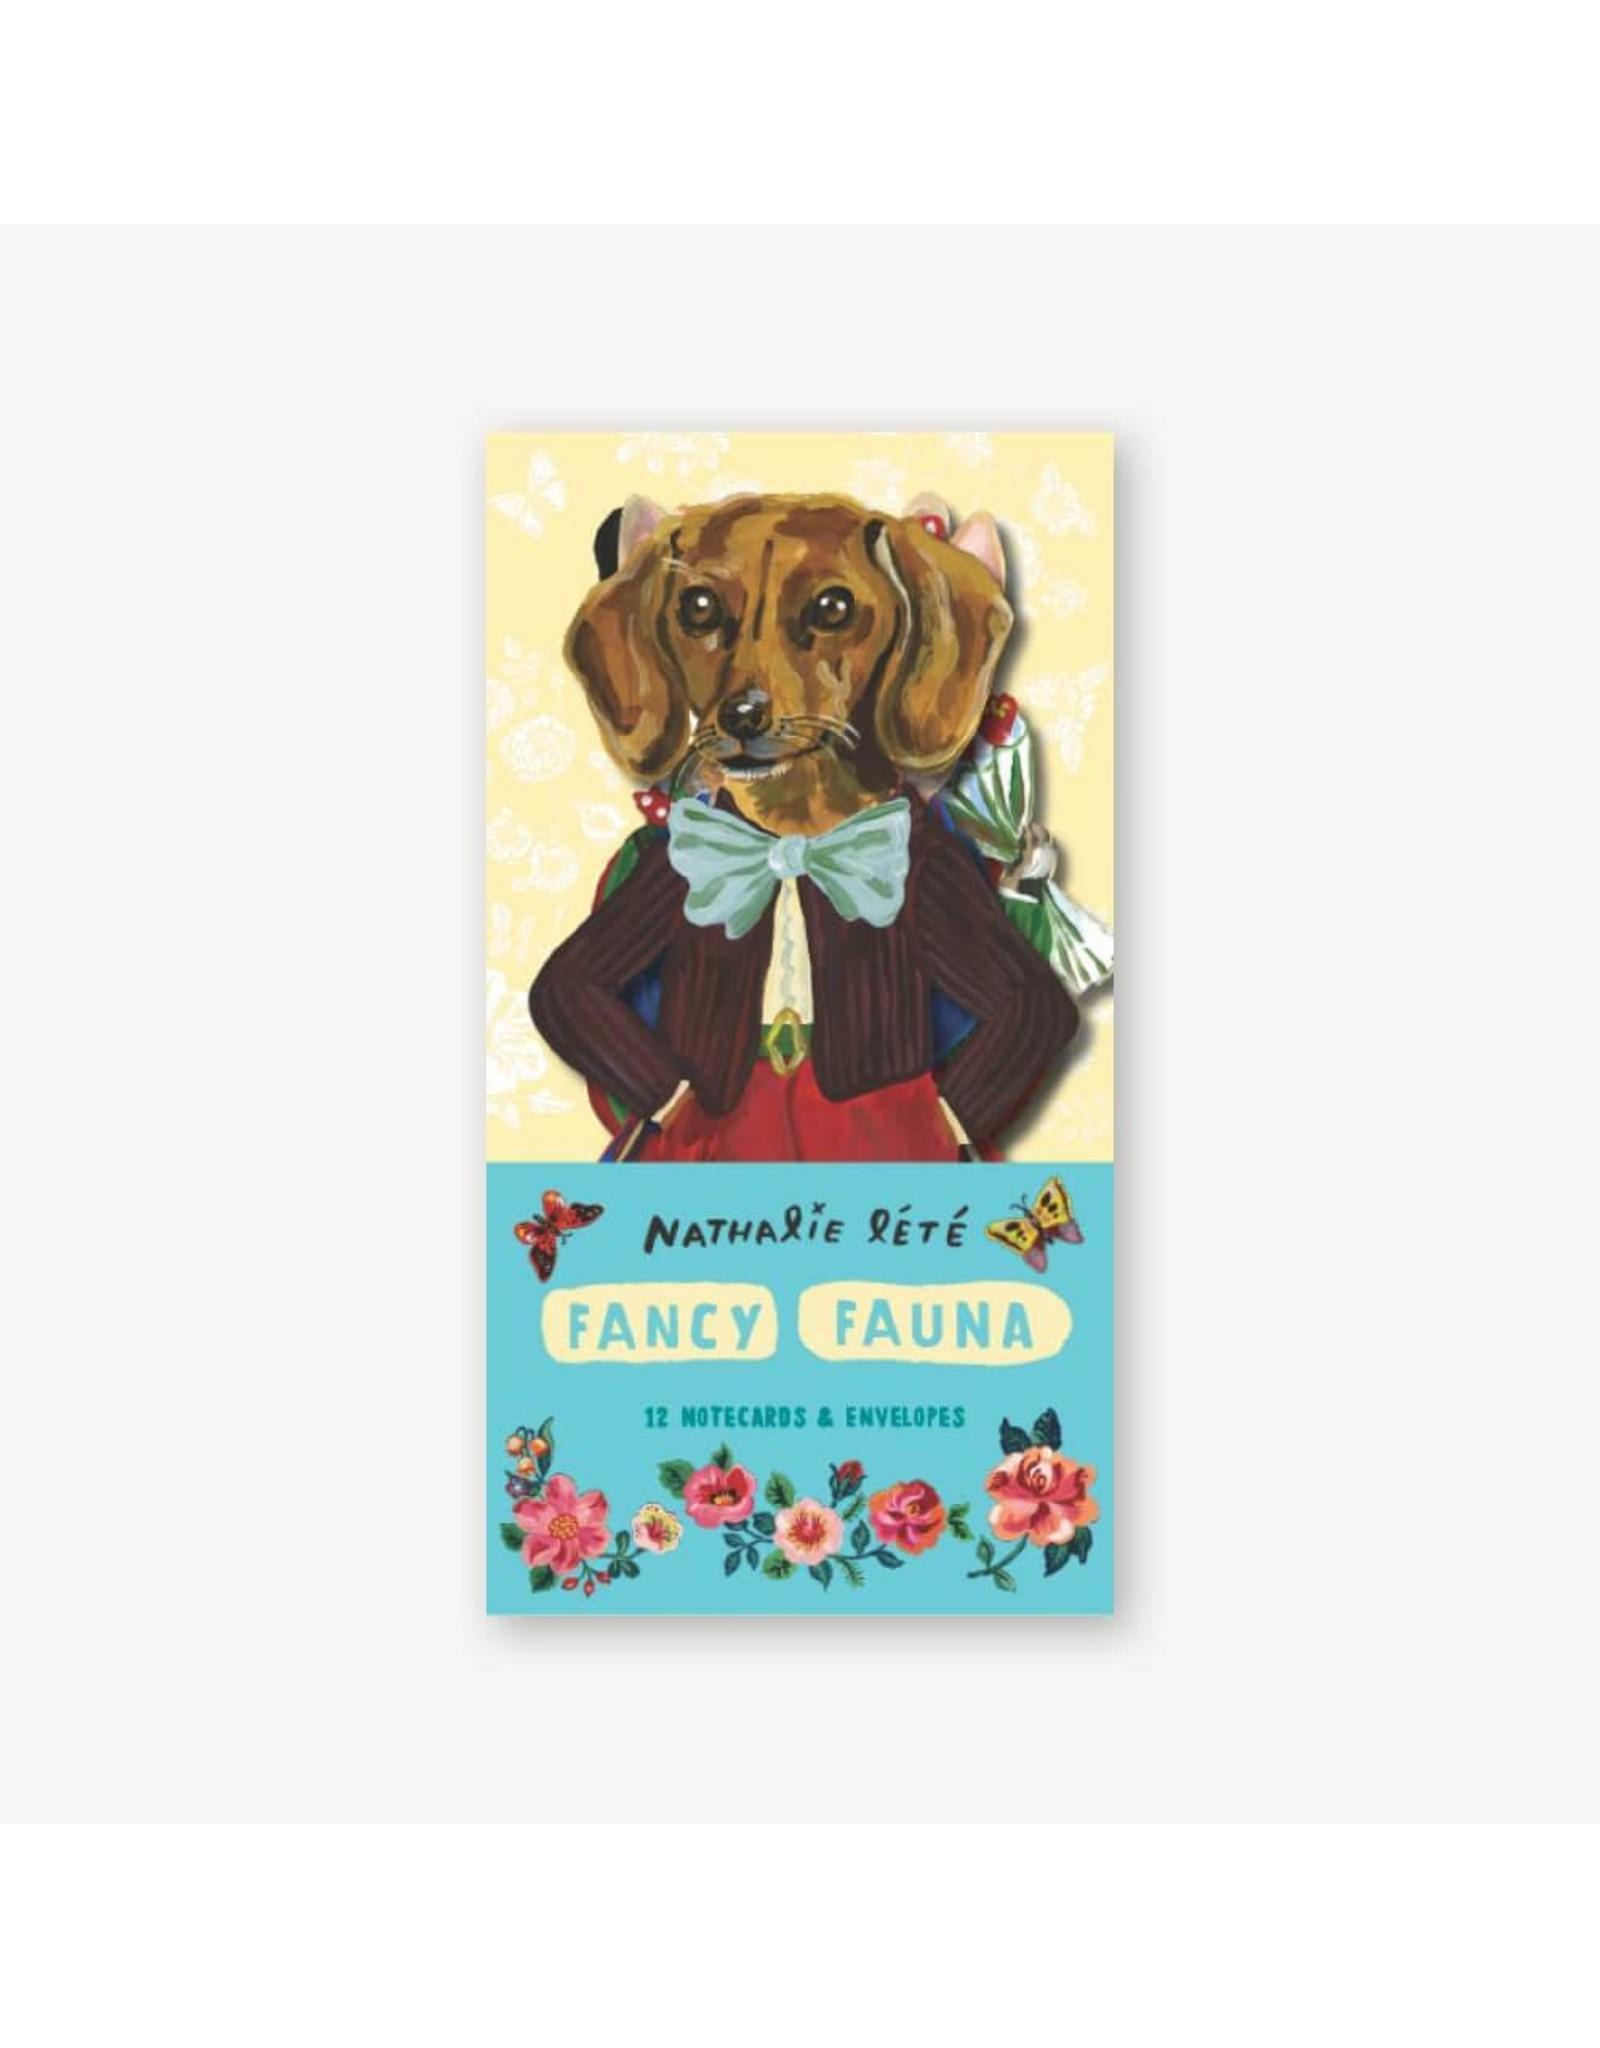 Raincoast Books Fancy Fauna: 12 Notecards & Envelopes